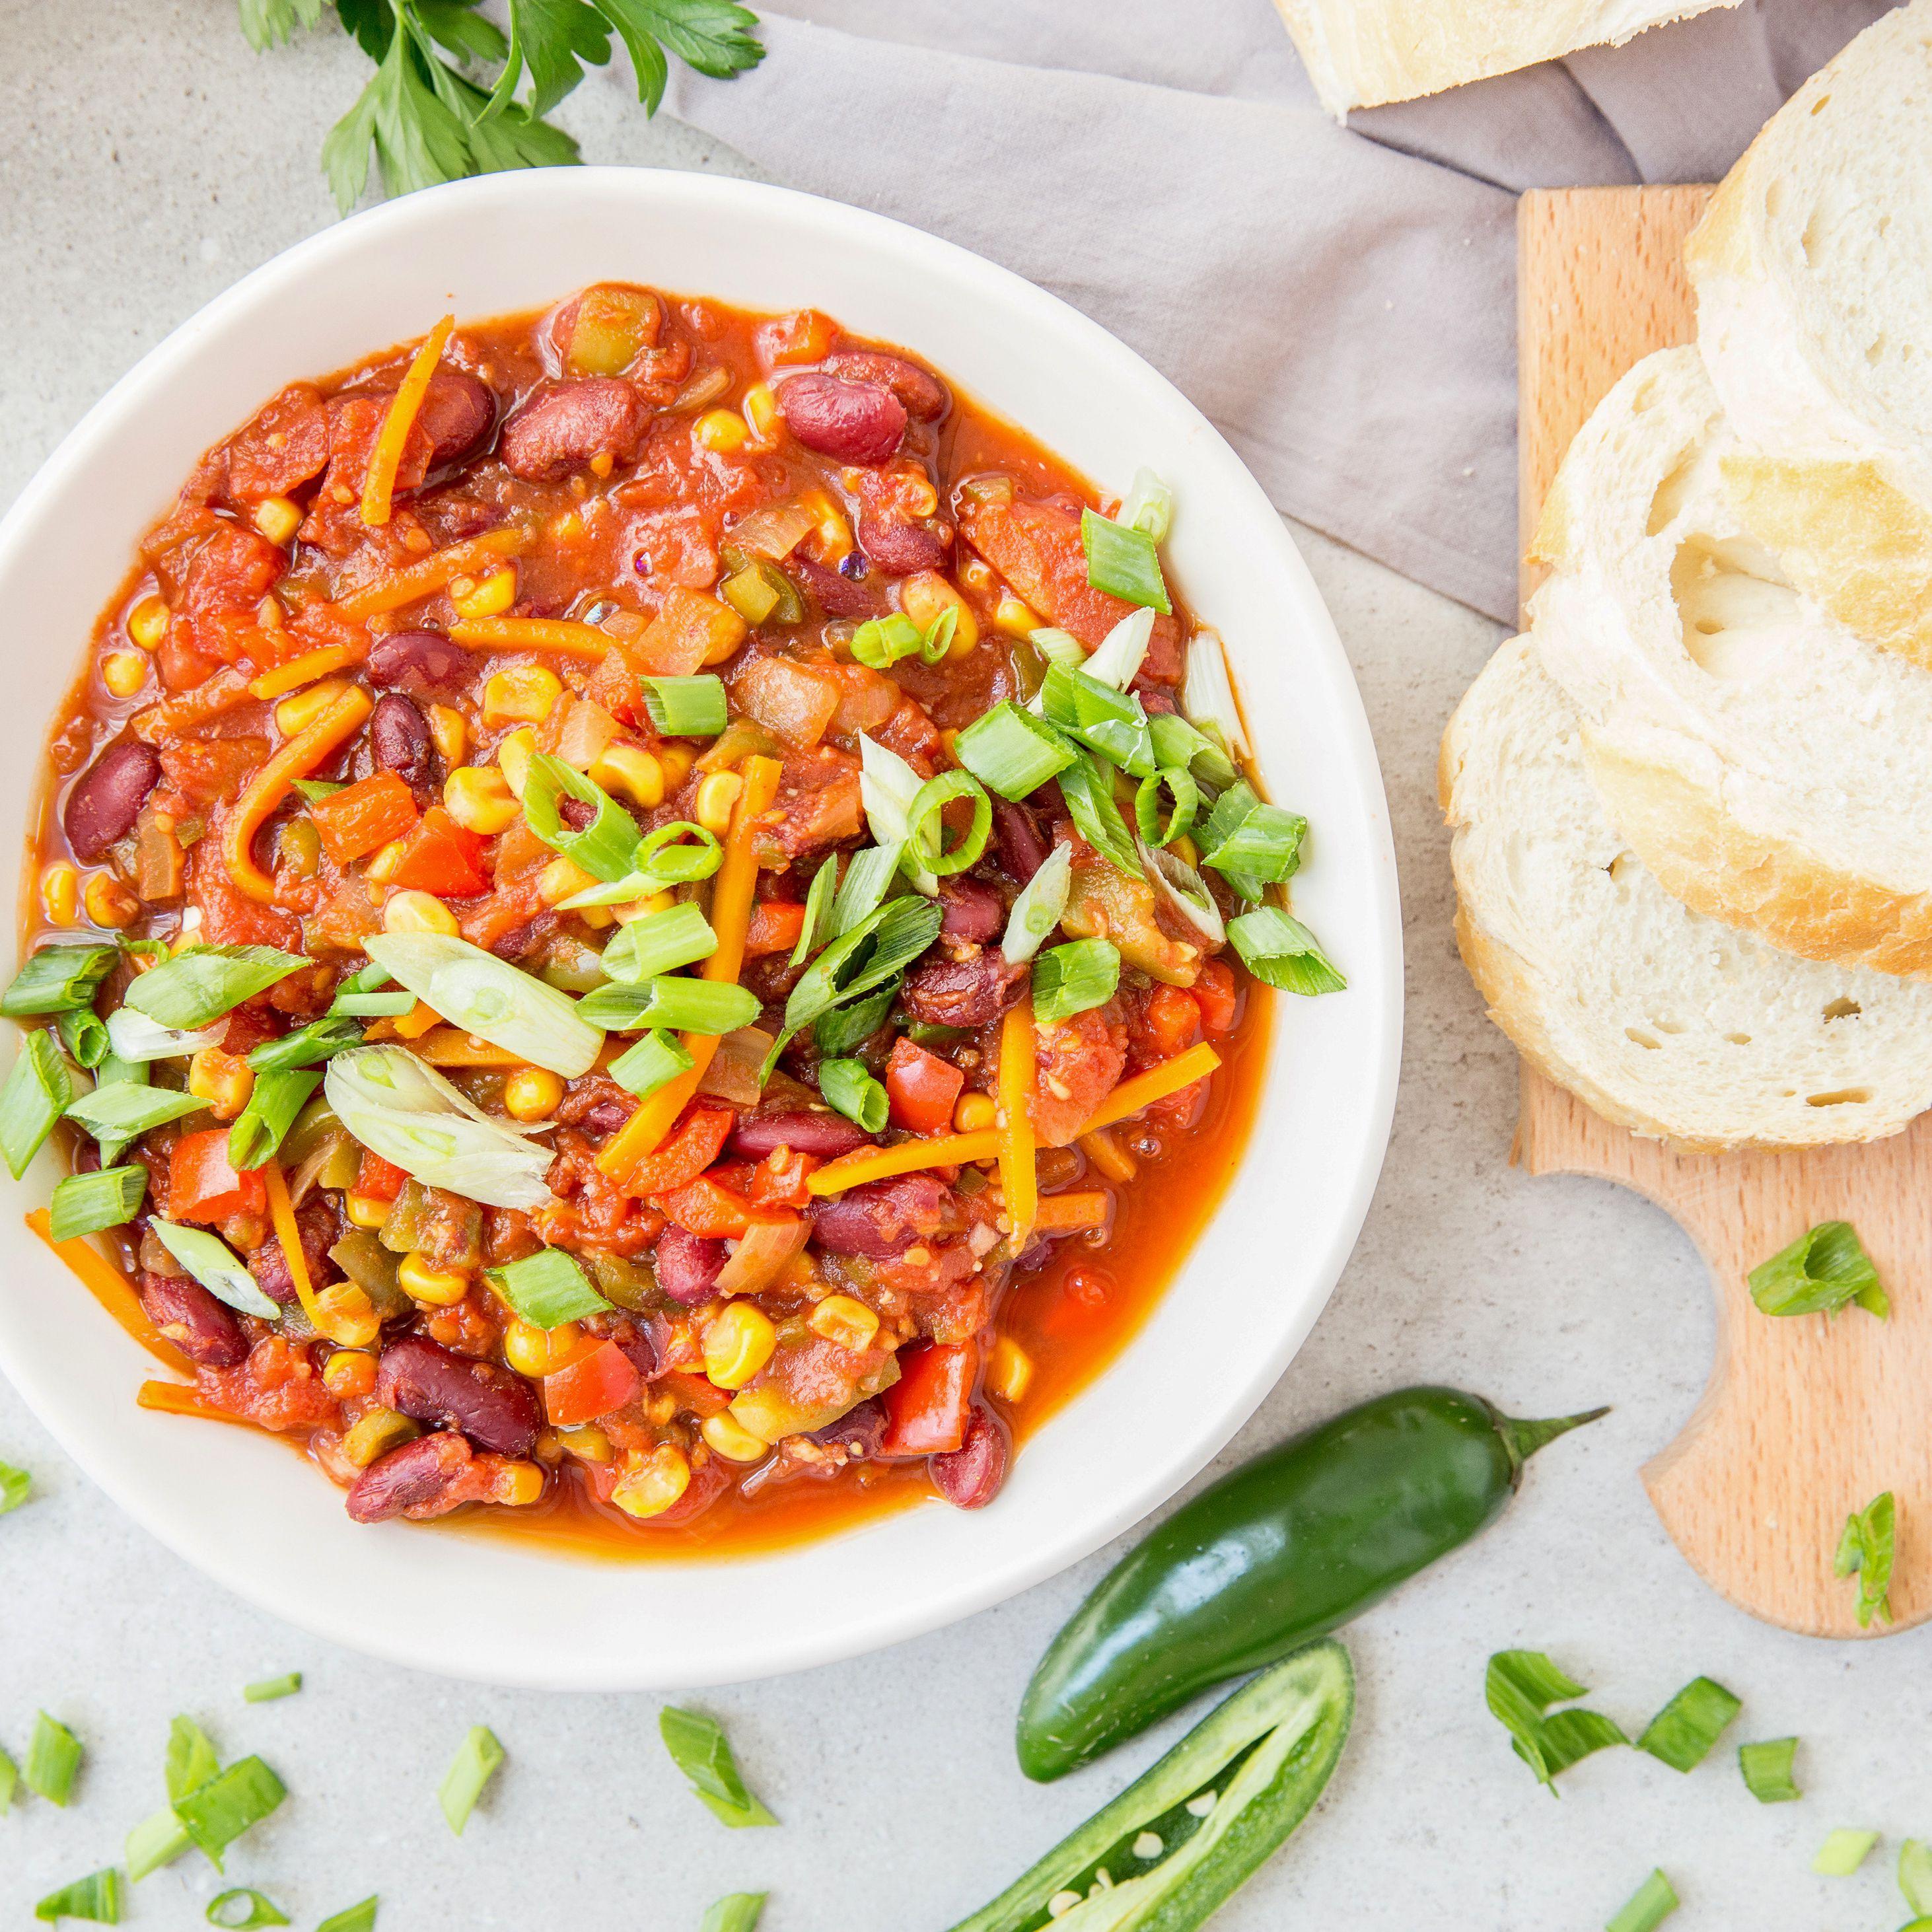 Low Calorie Fat Free Vegan Vegetable Chili Recipe